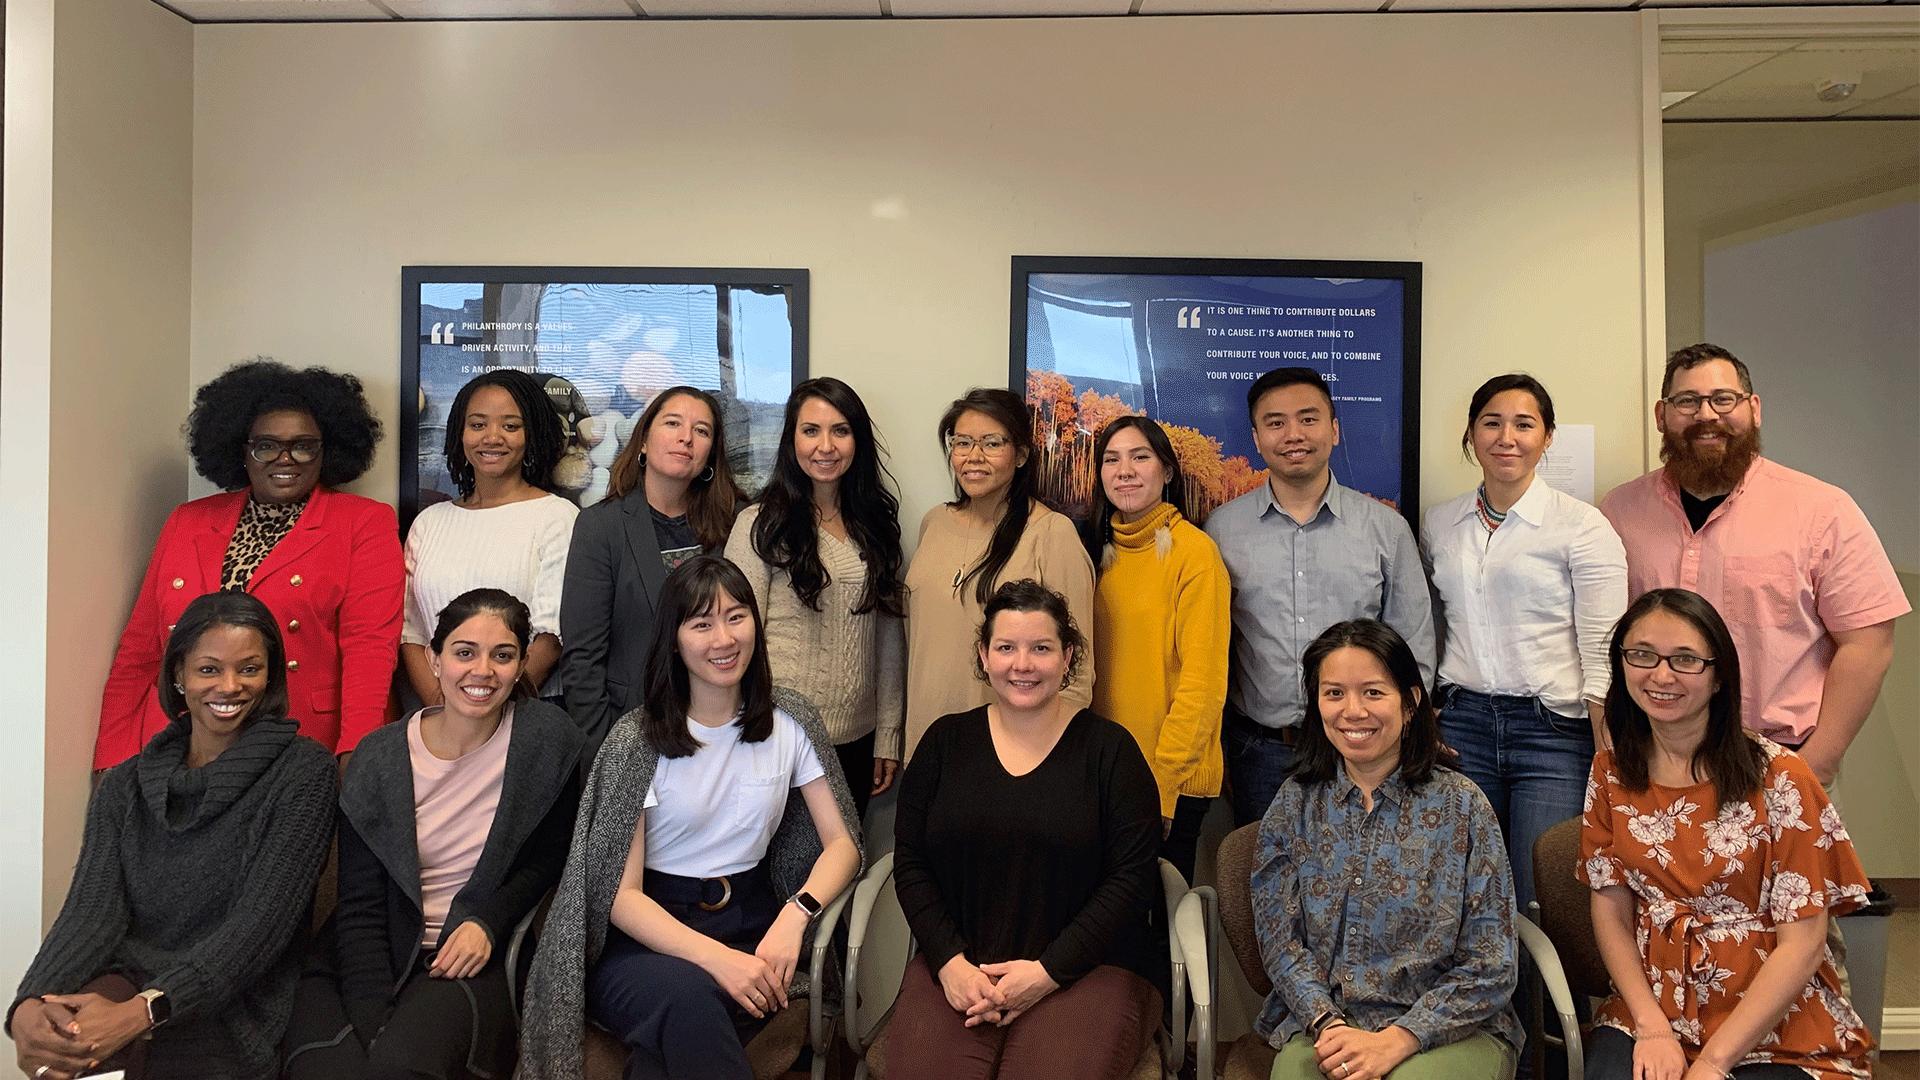 Group photo of Philanthropy Northwest's Cohort 3 of Momentum Fellows